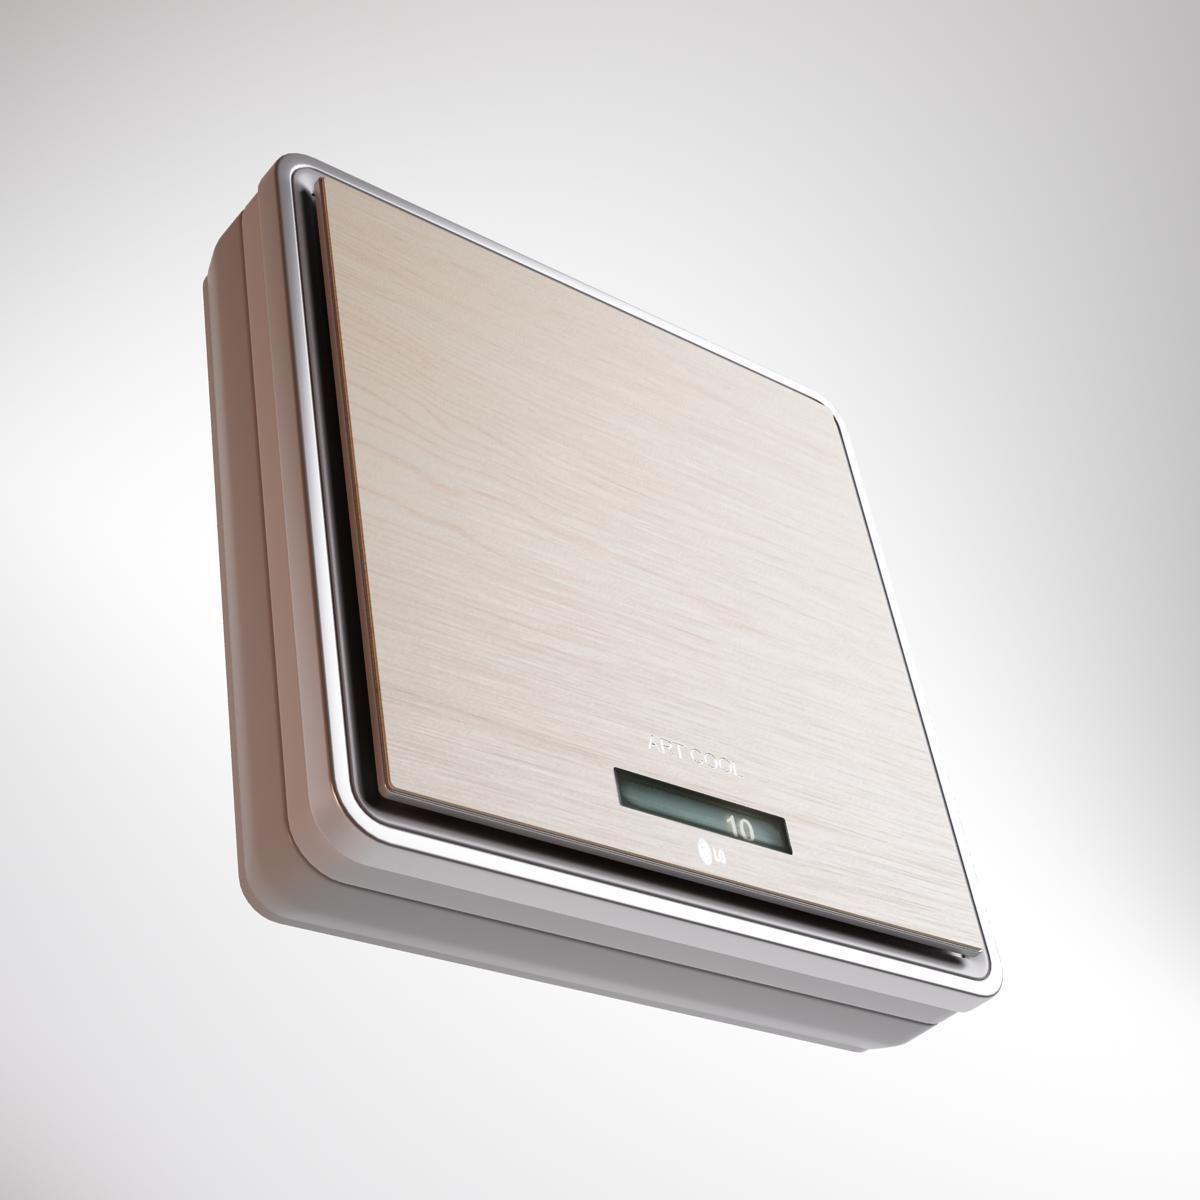 ... lg art cool air conditioners 3d model max 3ds fbx 6 ...